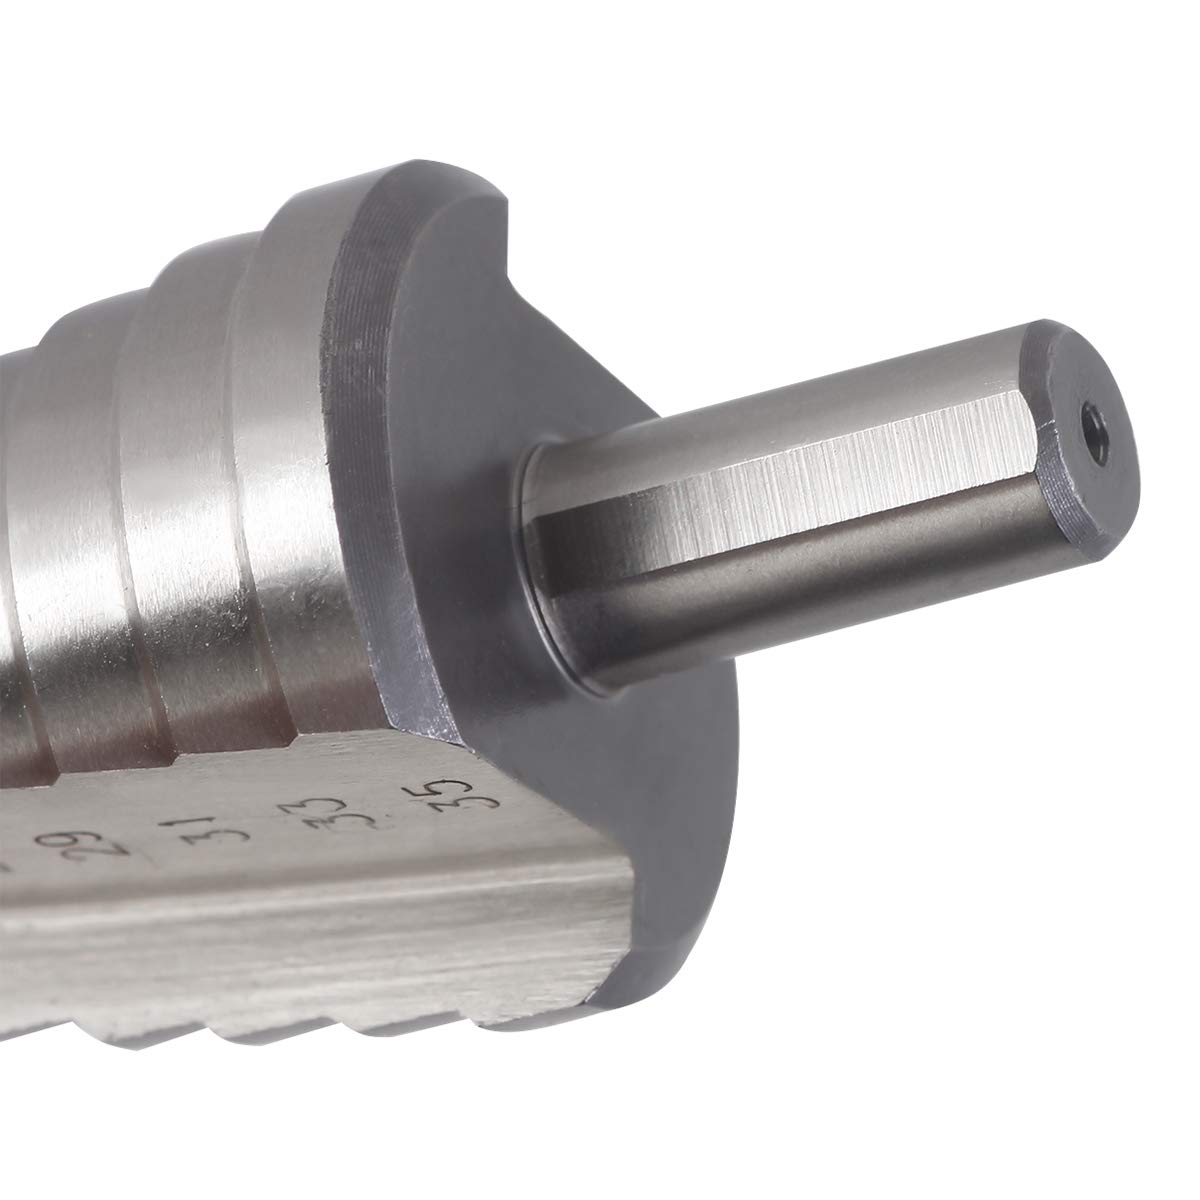 KSEIBI 575055 HSS-M2 10Steps Round Shank Straight Flute Step Drill 1//4-1-3//8inch